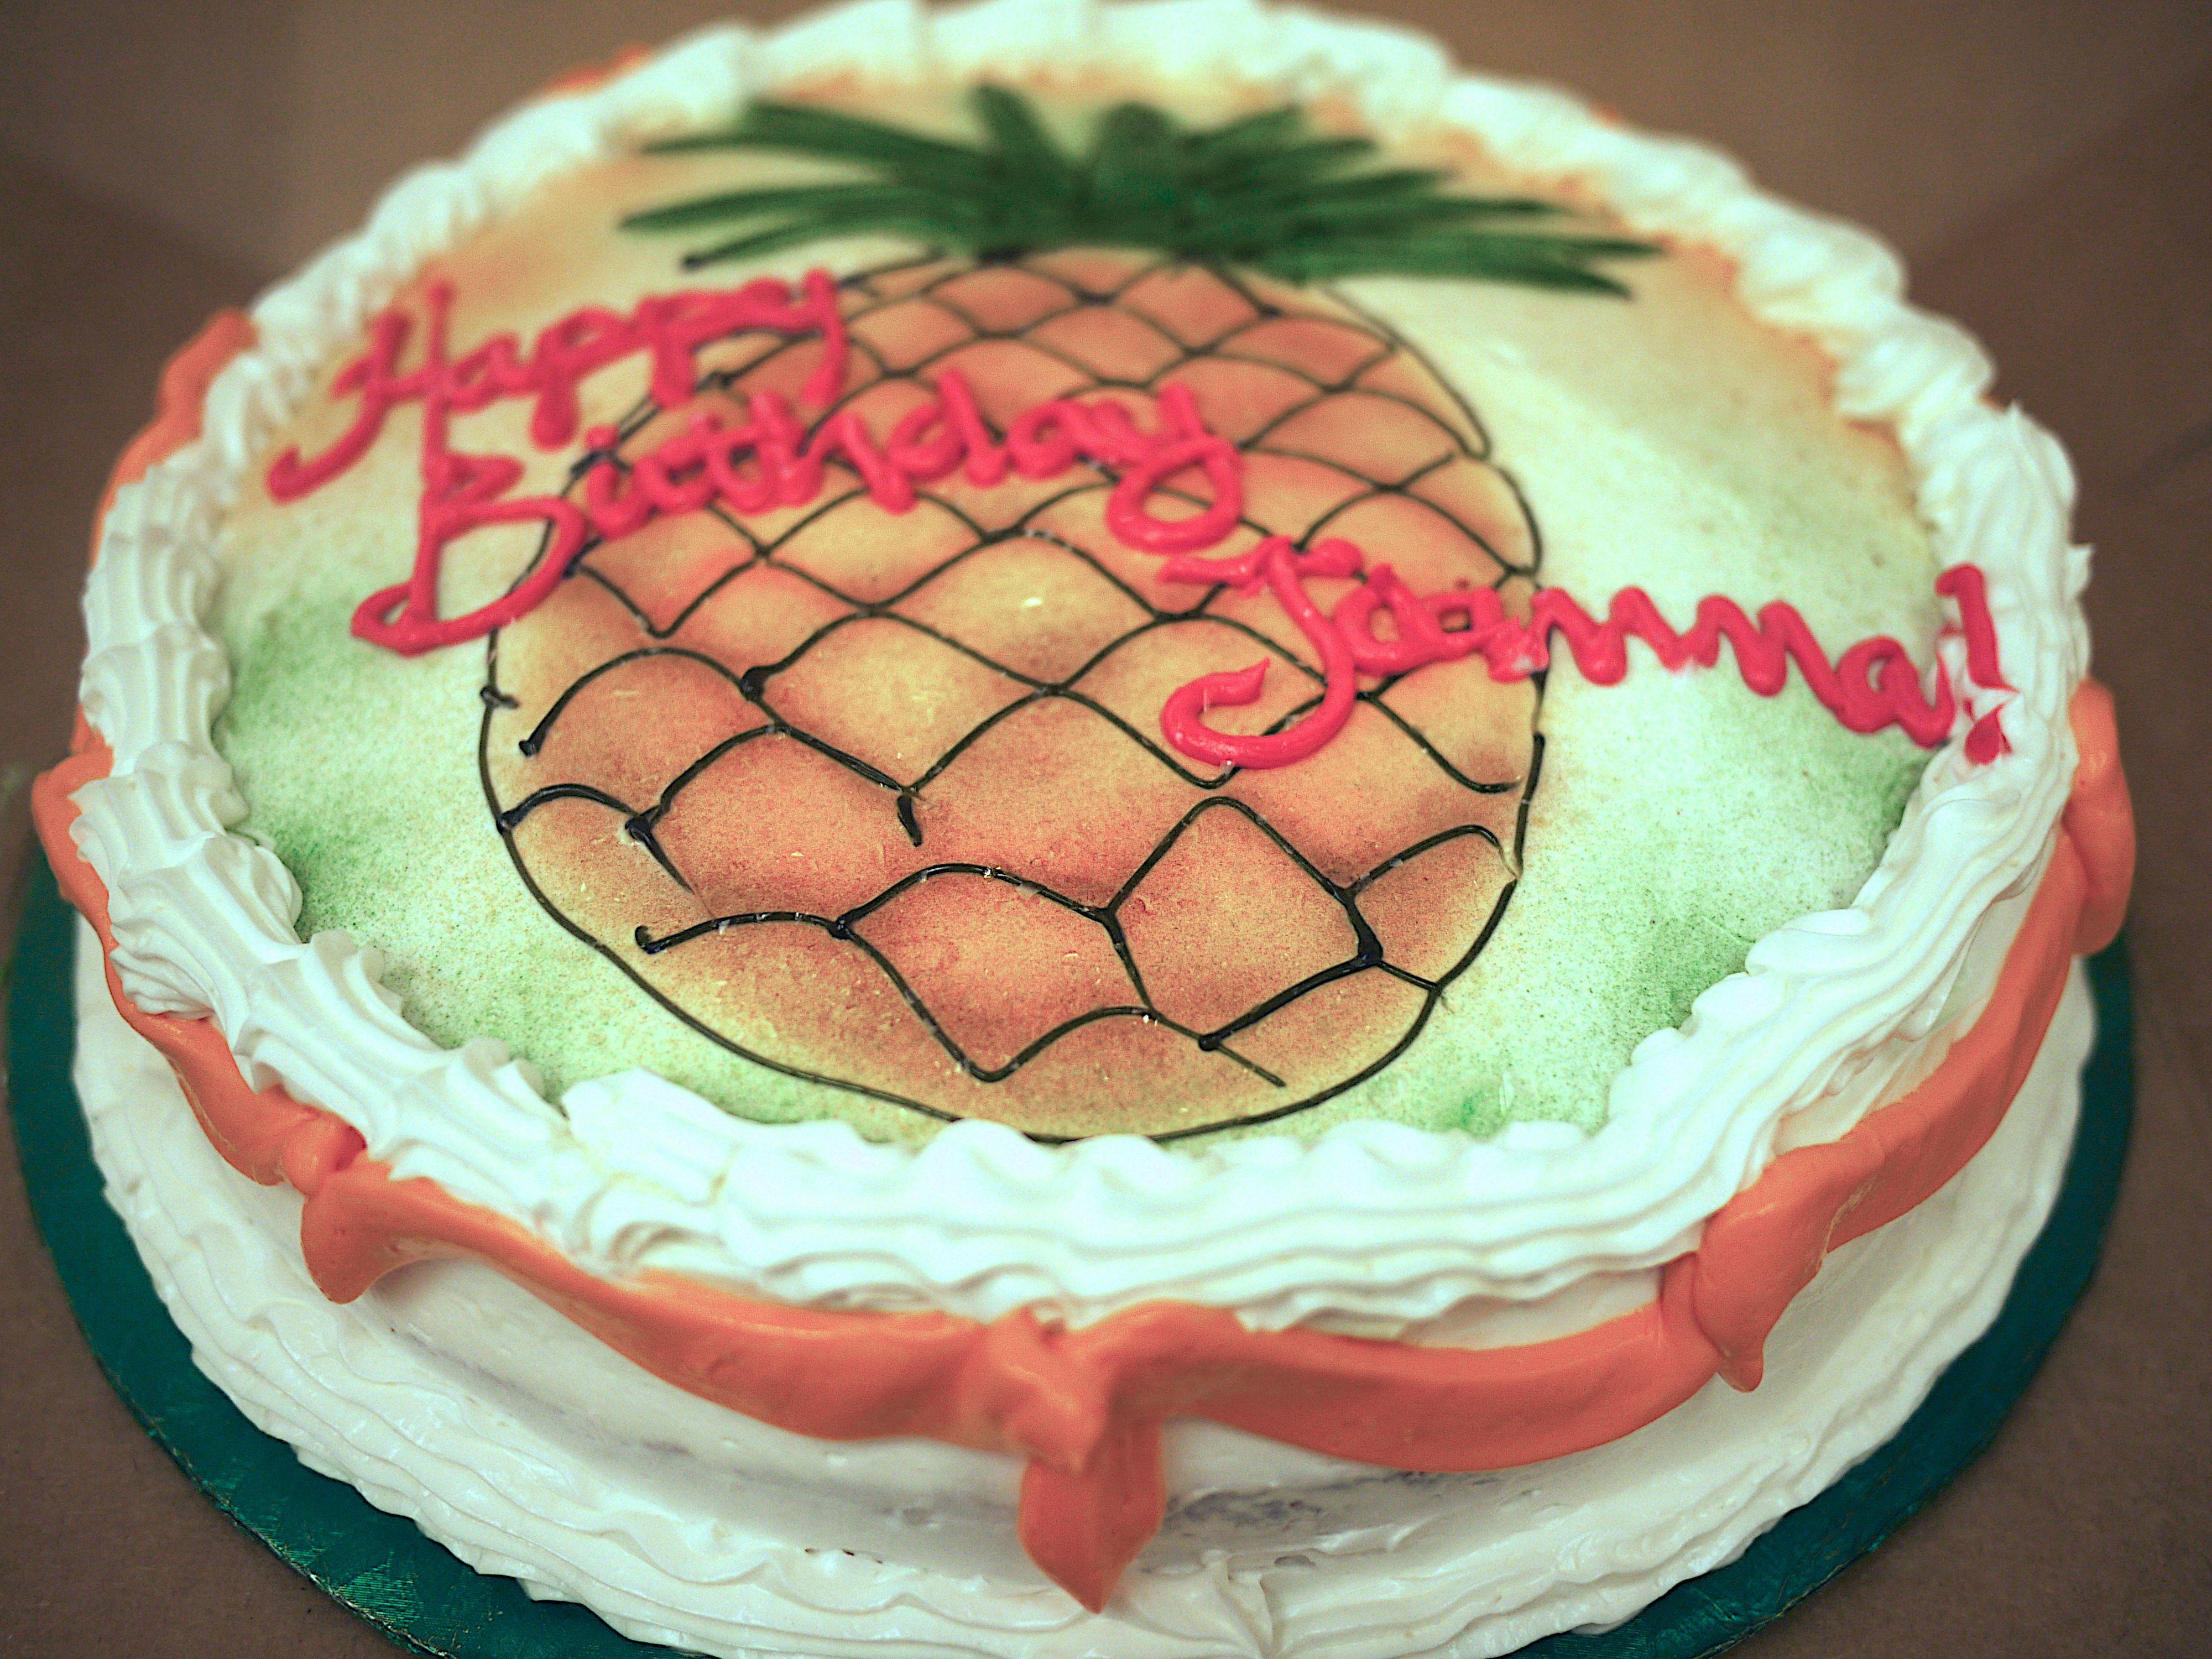 Birthday Cake For Frankie Jo For Her Birthday Representing